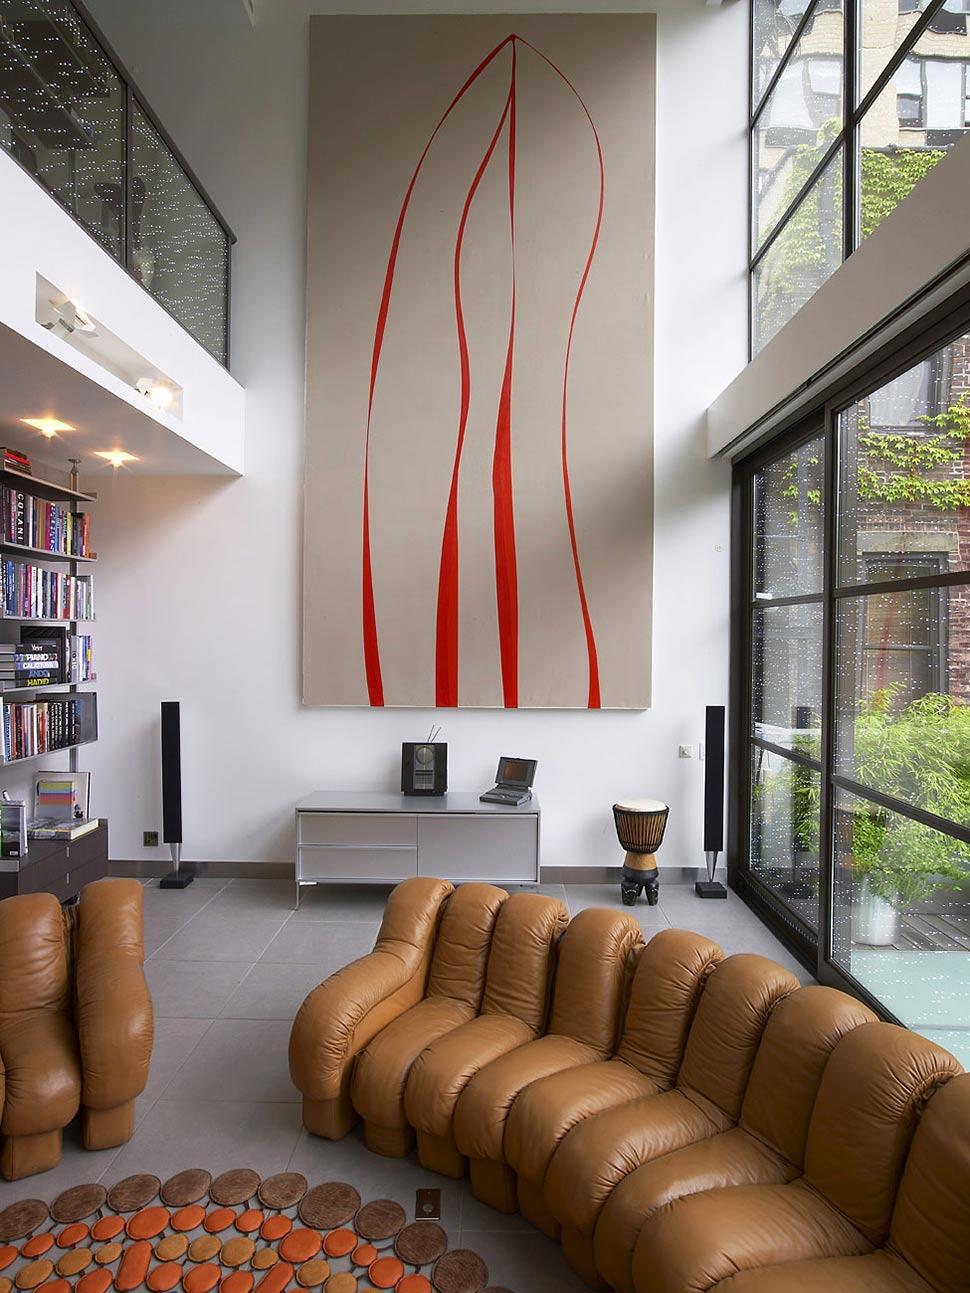 Glass Walls, Art, Bookshelf, Townhouse Renovation in Gramercy Park, New York